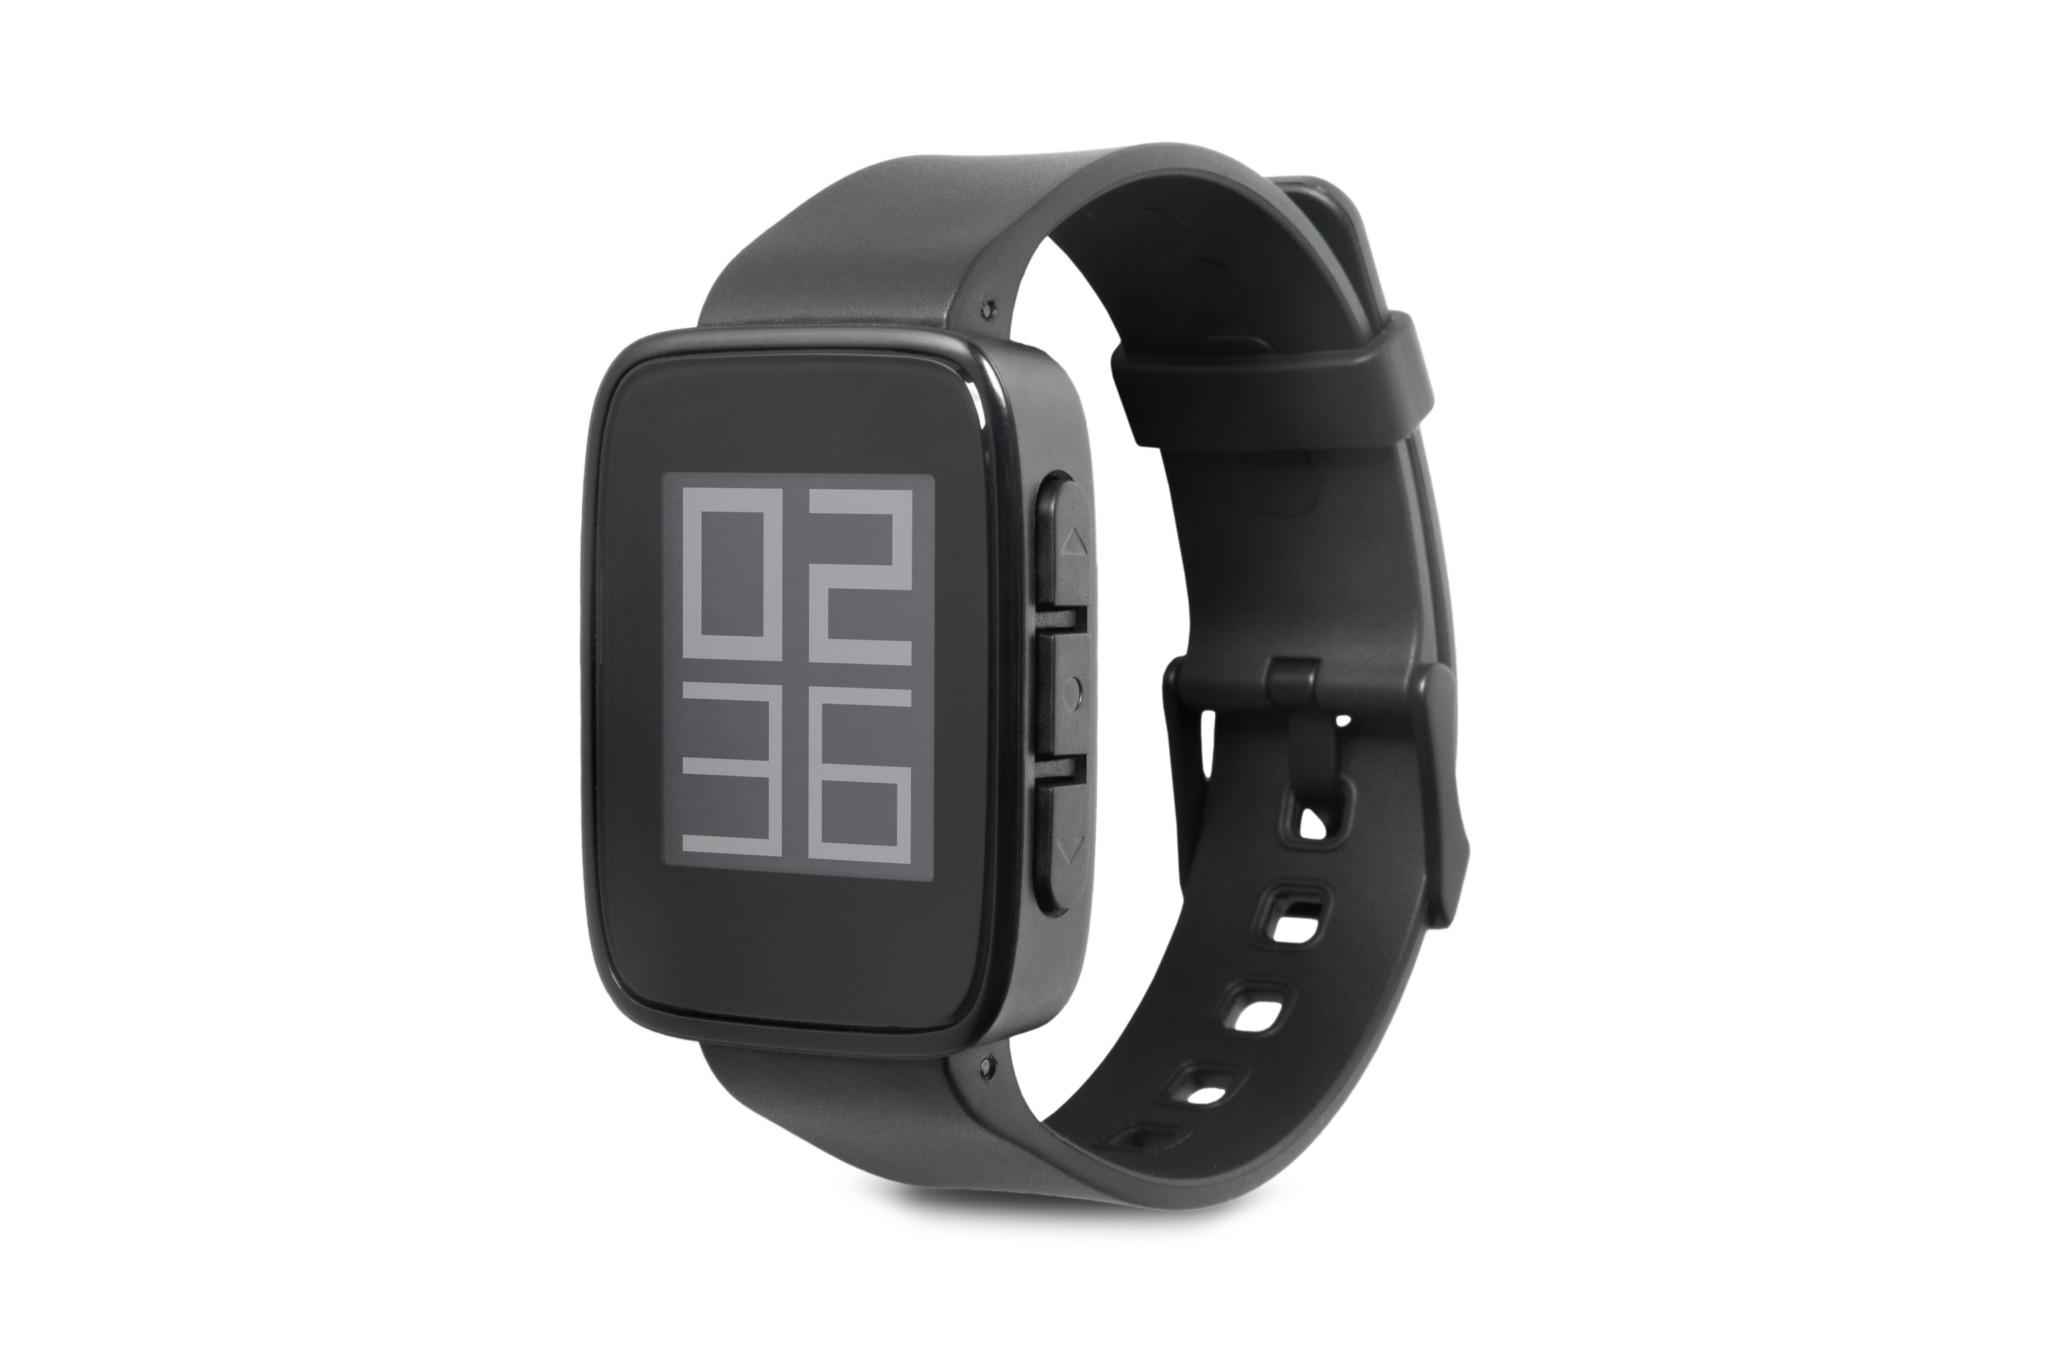 Goclever uvedl chytré hodinky Chronos Eco